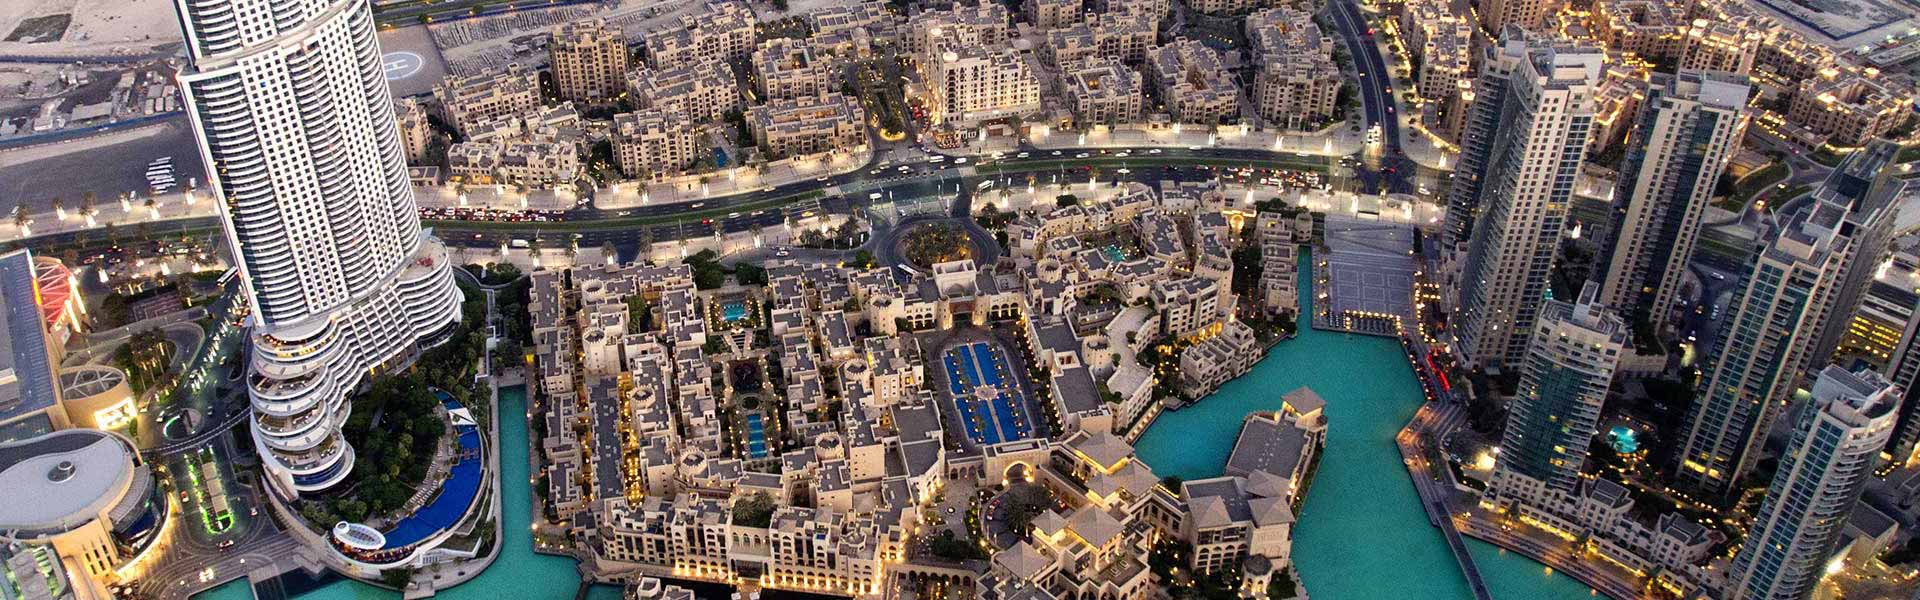 Ariel view of Dubai Skyline